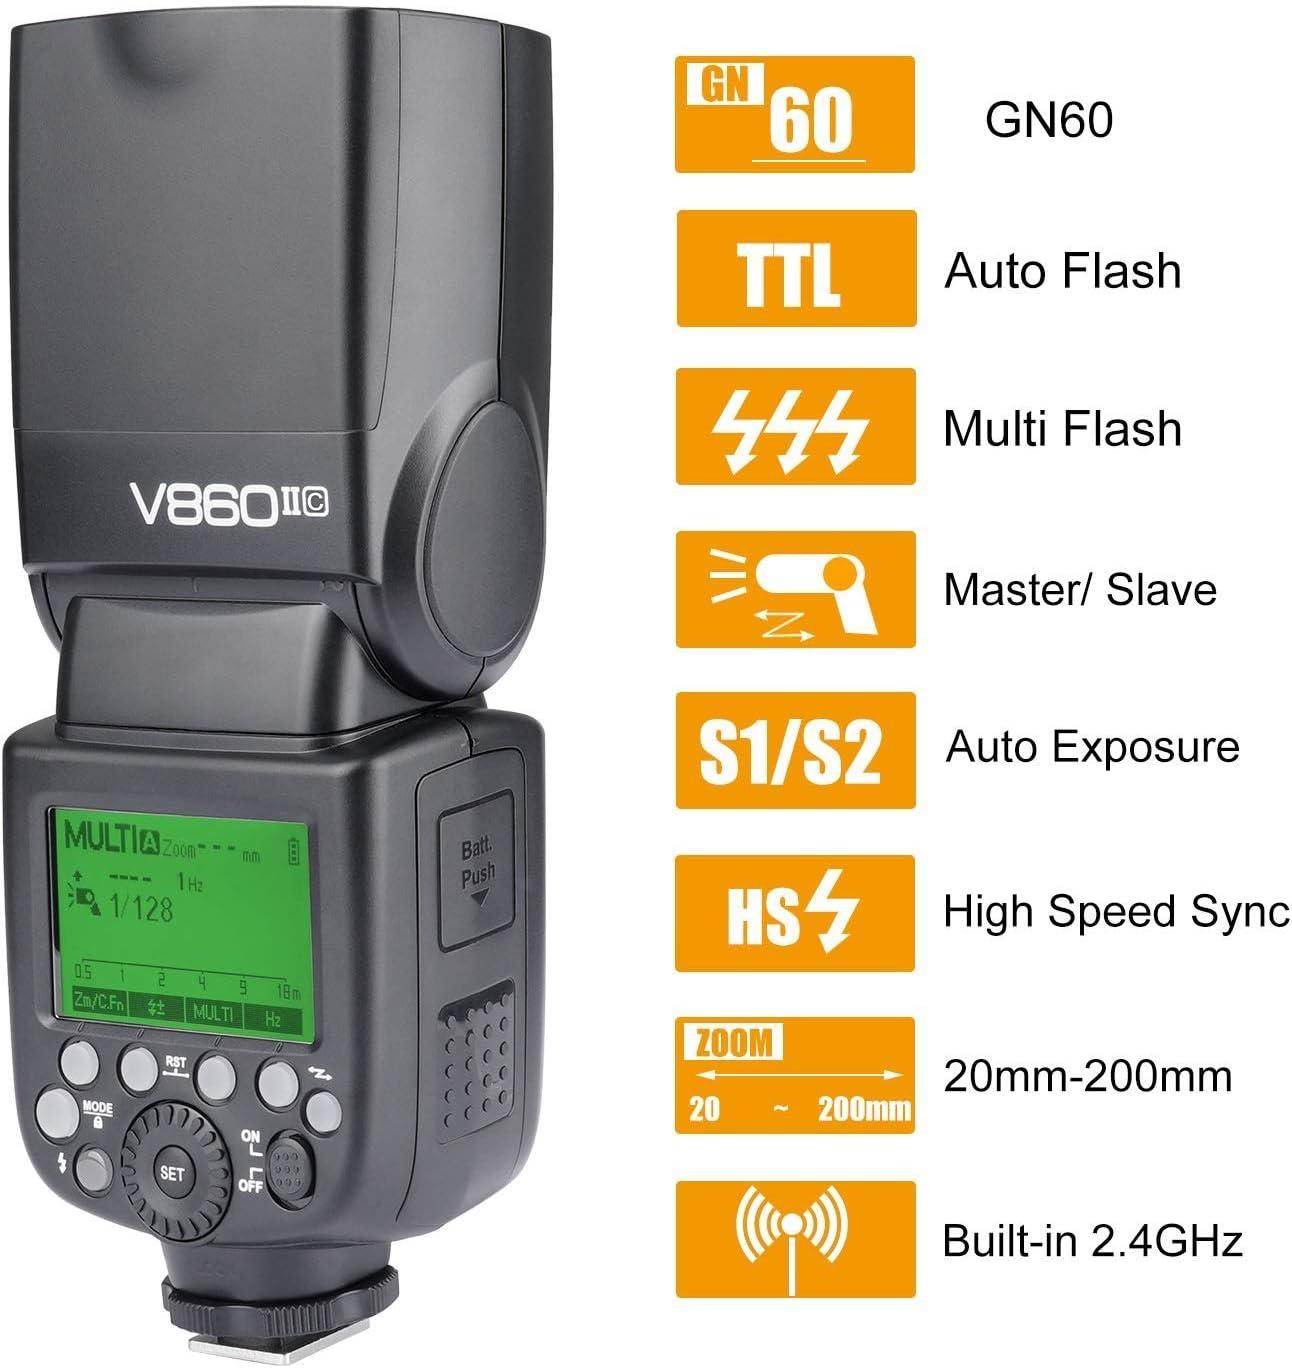 Godox V860II-C E-TTL 2.4G GN60 Li-ion Battery High Speed Sync 1//8000s 1.5s Recycle Time Camera Flash Speedlite Light for Canon 6D 7D 7D2 50D 60D 1DX 580EX II 5D Mark II III 1DX21 550D 650D 760D